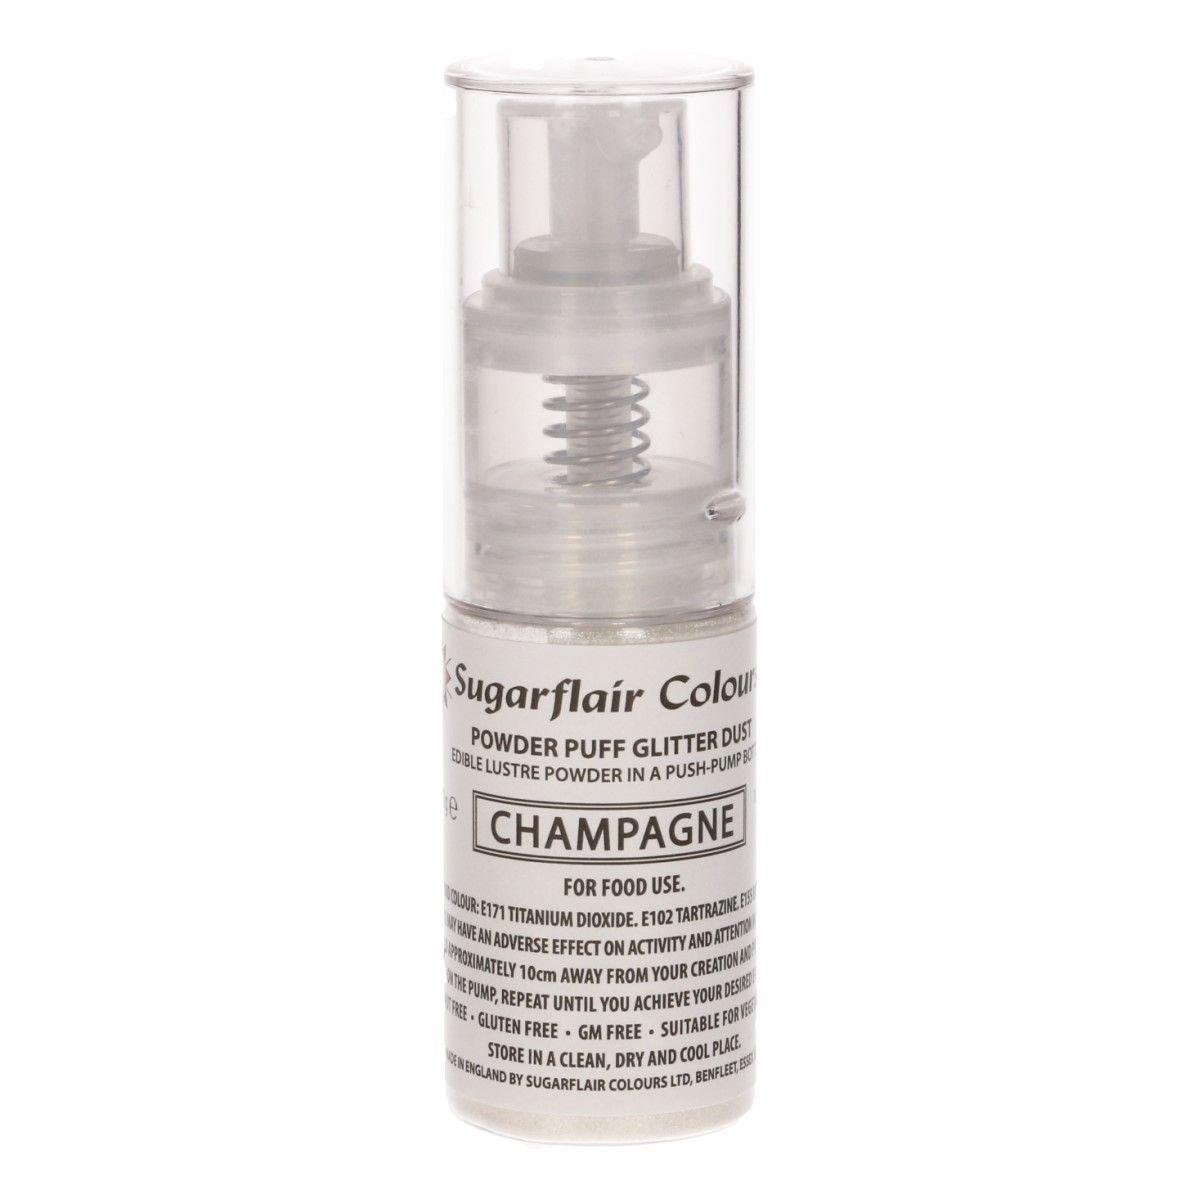 Sugarflair Powder Puff Glitter Dust Pump Spray - Champagne 10g -  Βρώσιμο γκλίτερ σαμπανιζέ σε αντλία